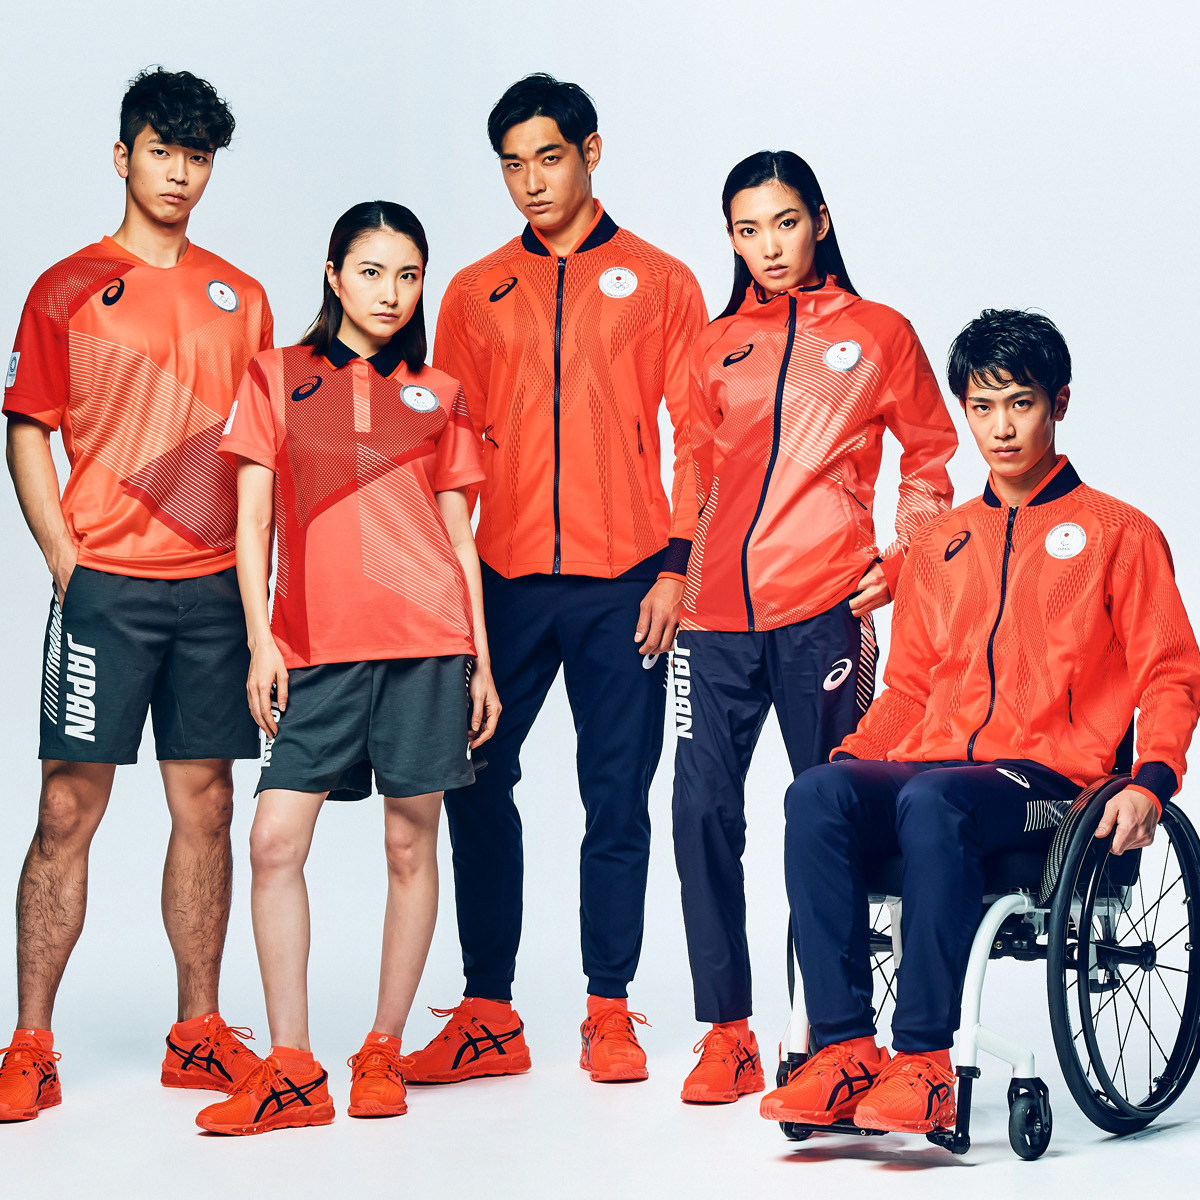 Wow, Seragam Olimpiade Timnas Jepang Ternyata Hasil Daur Ulang!